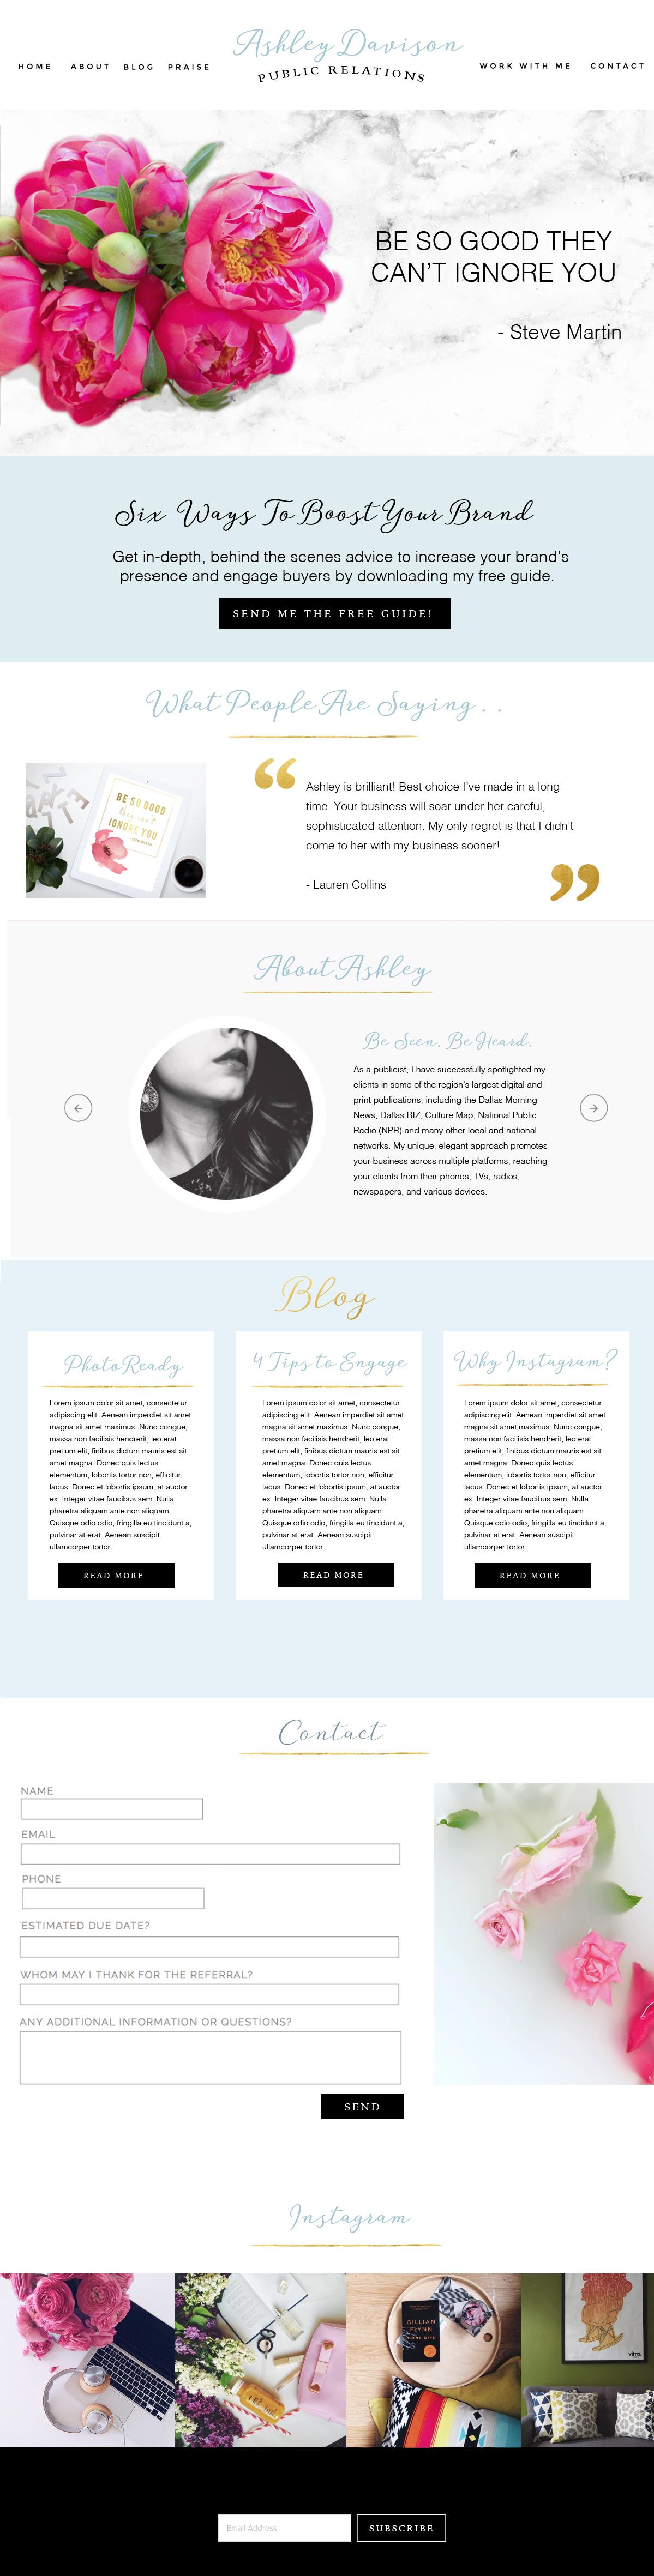 Ashley Davison - Beautiful Web Design